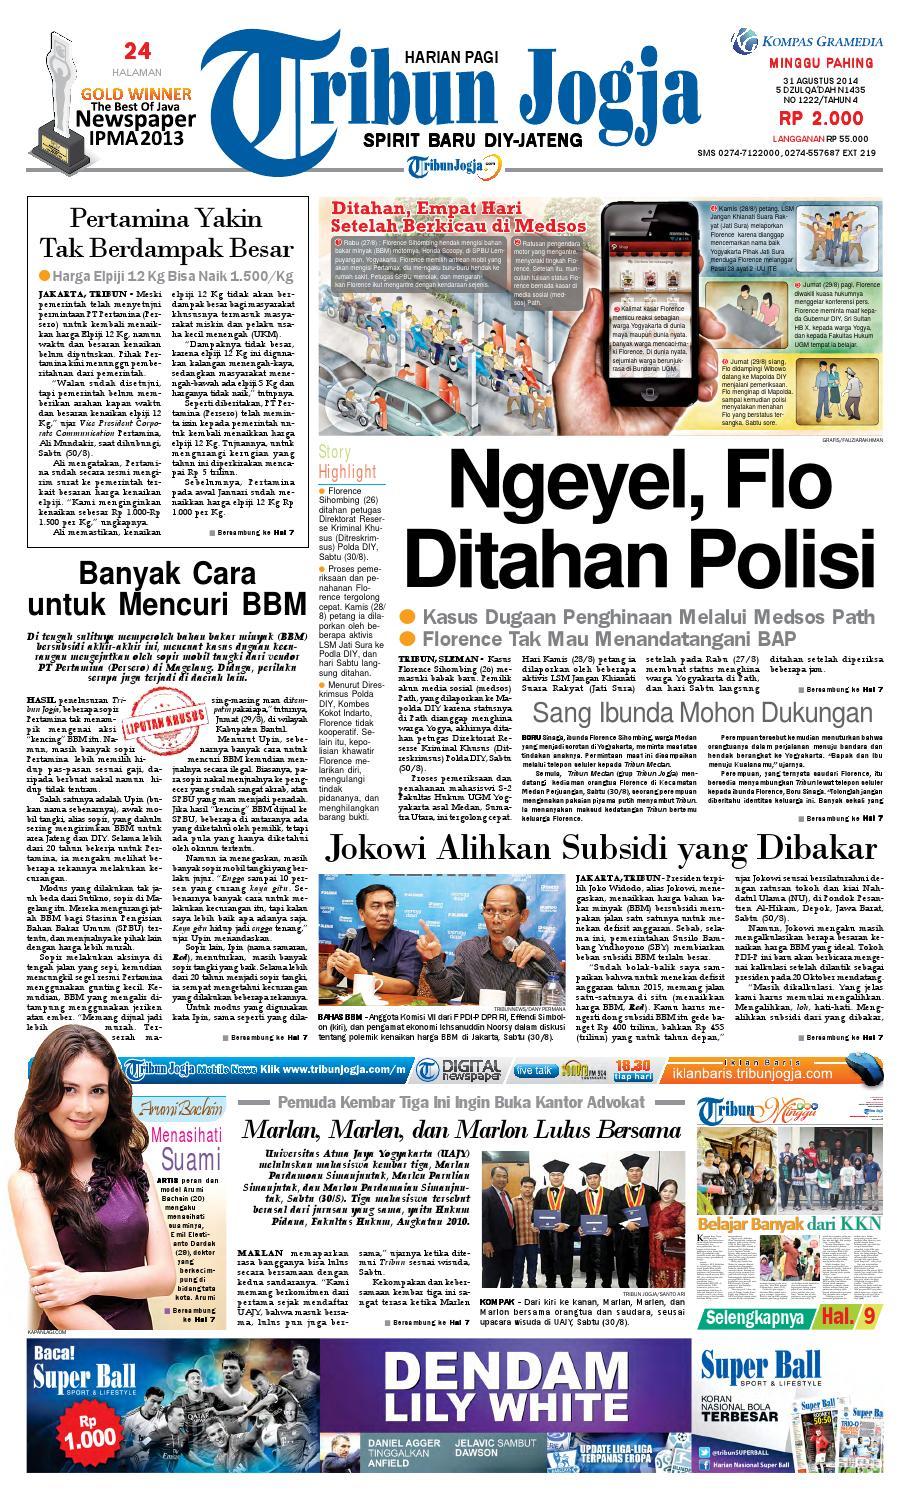 Tribunjogja 31 08 2014 By Tribun Jogja Issuu Produk Ukm Bumn Wisata Mewah Bali 3hr 2mlm